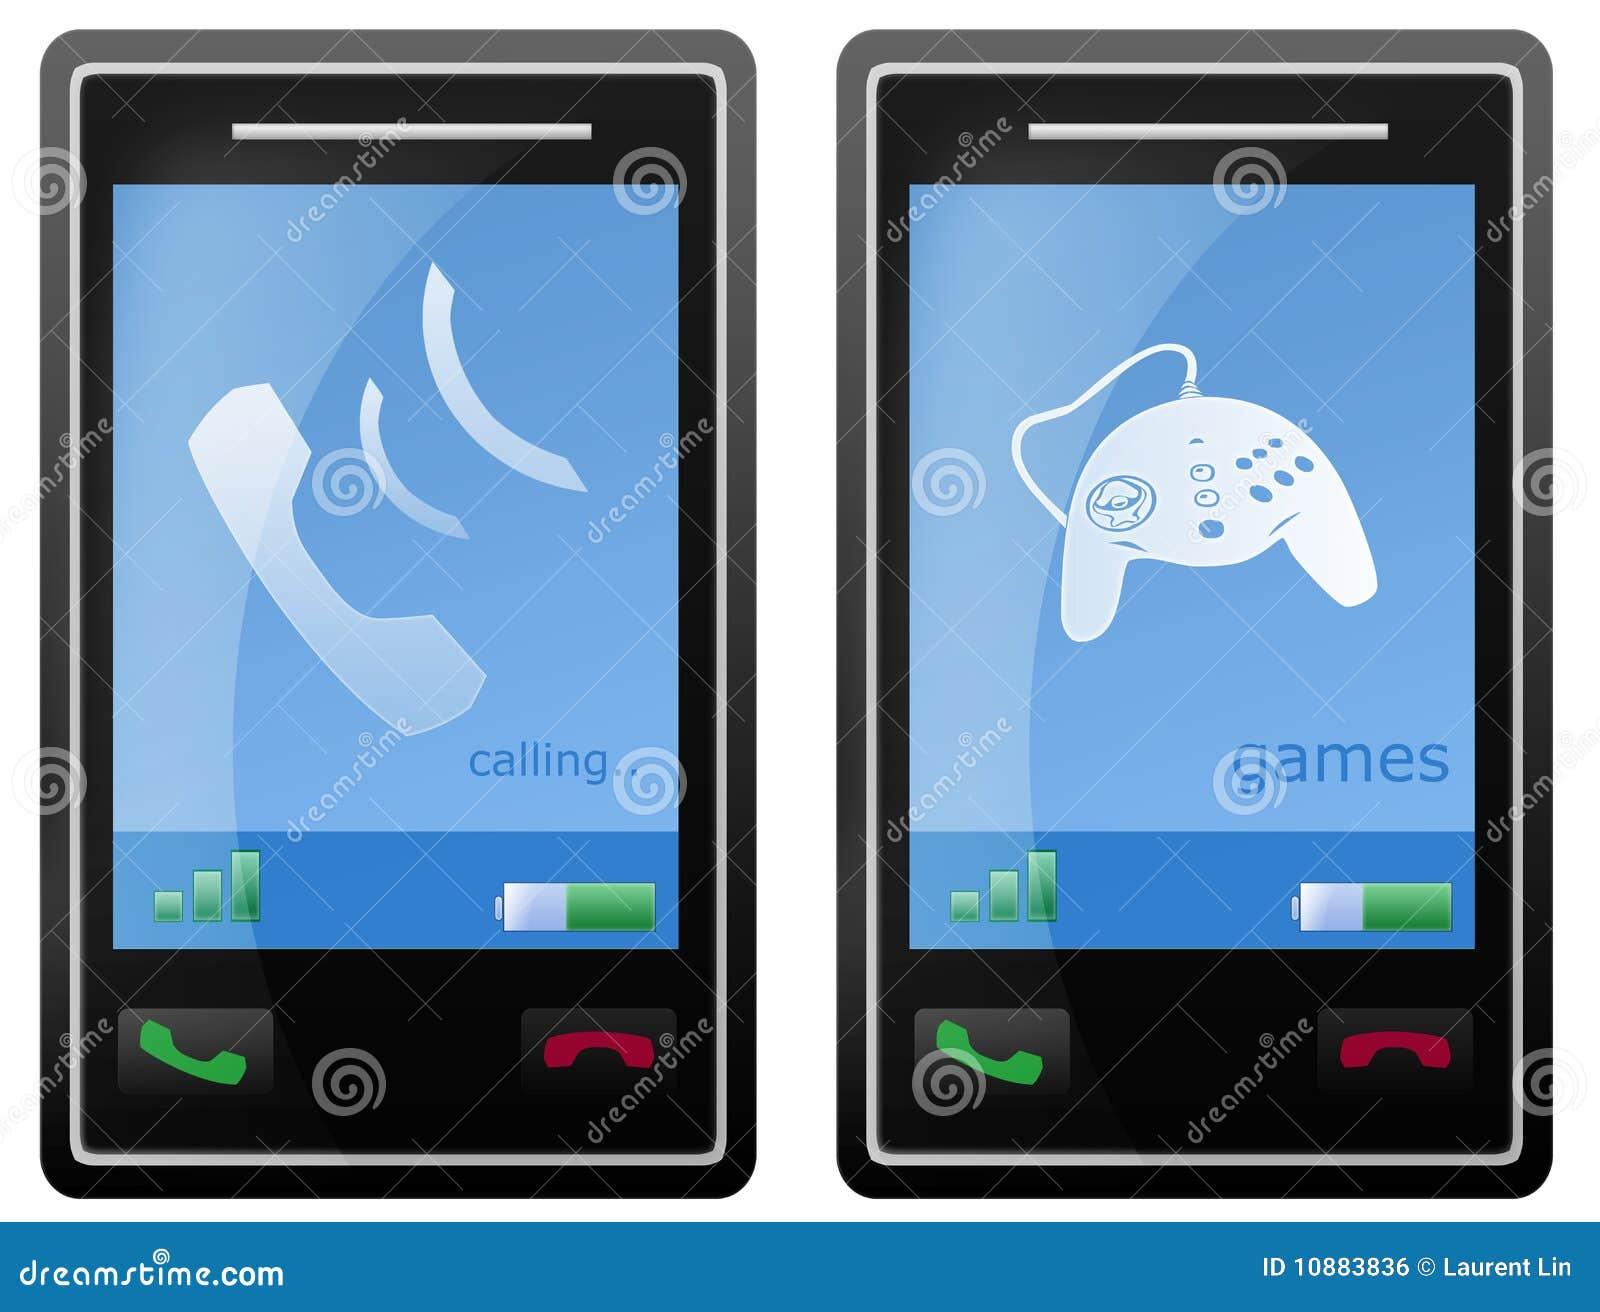 free call phone games